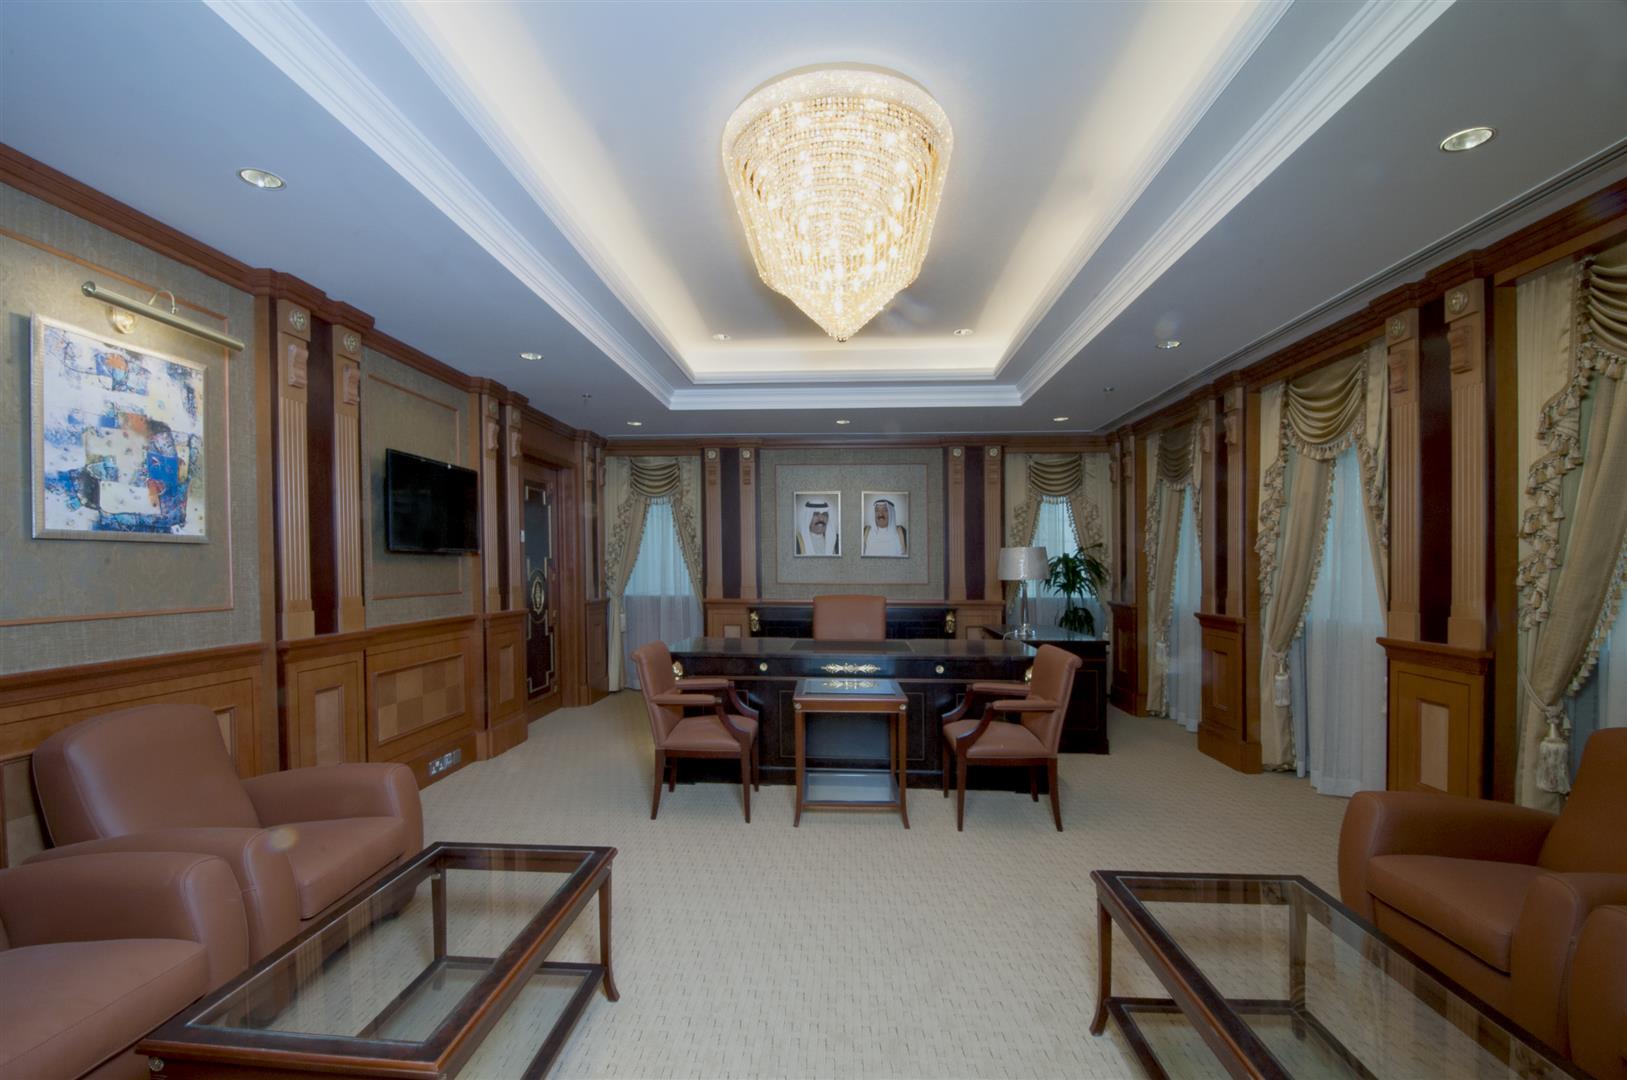 Caoza interios p ministerio interior kuwait for Ministerio interior